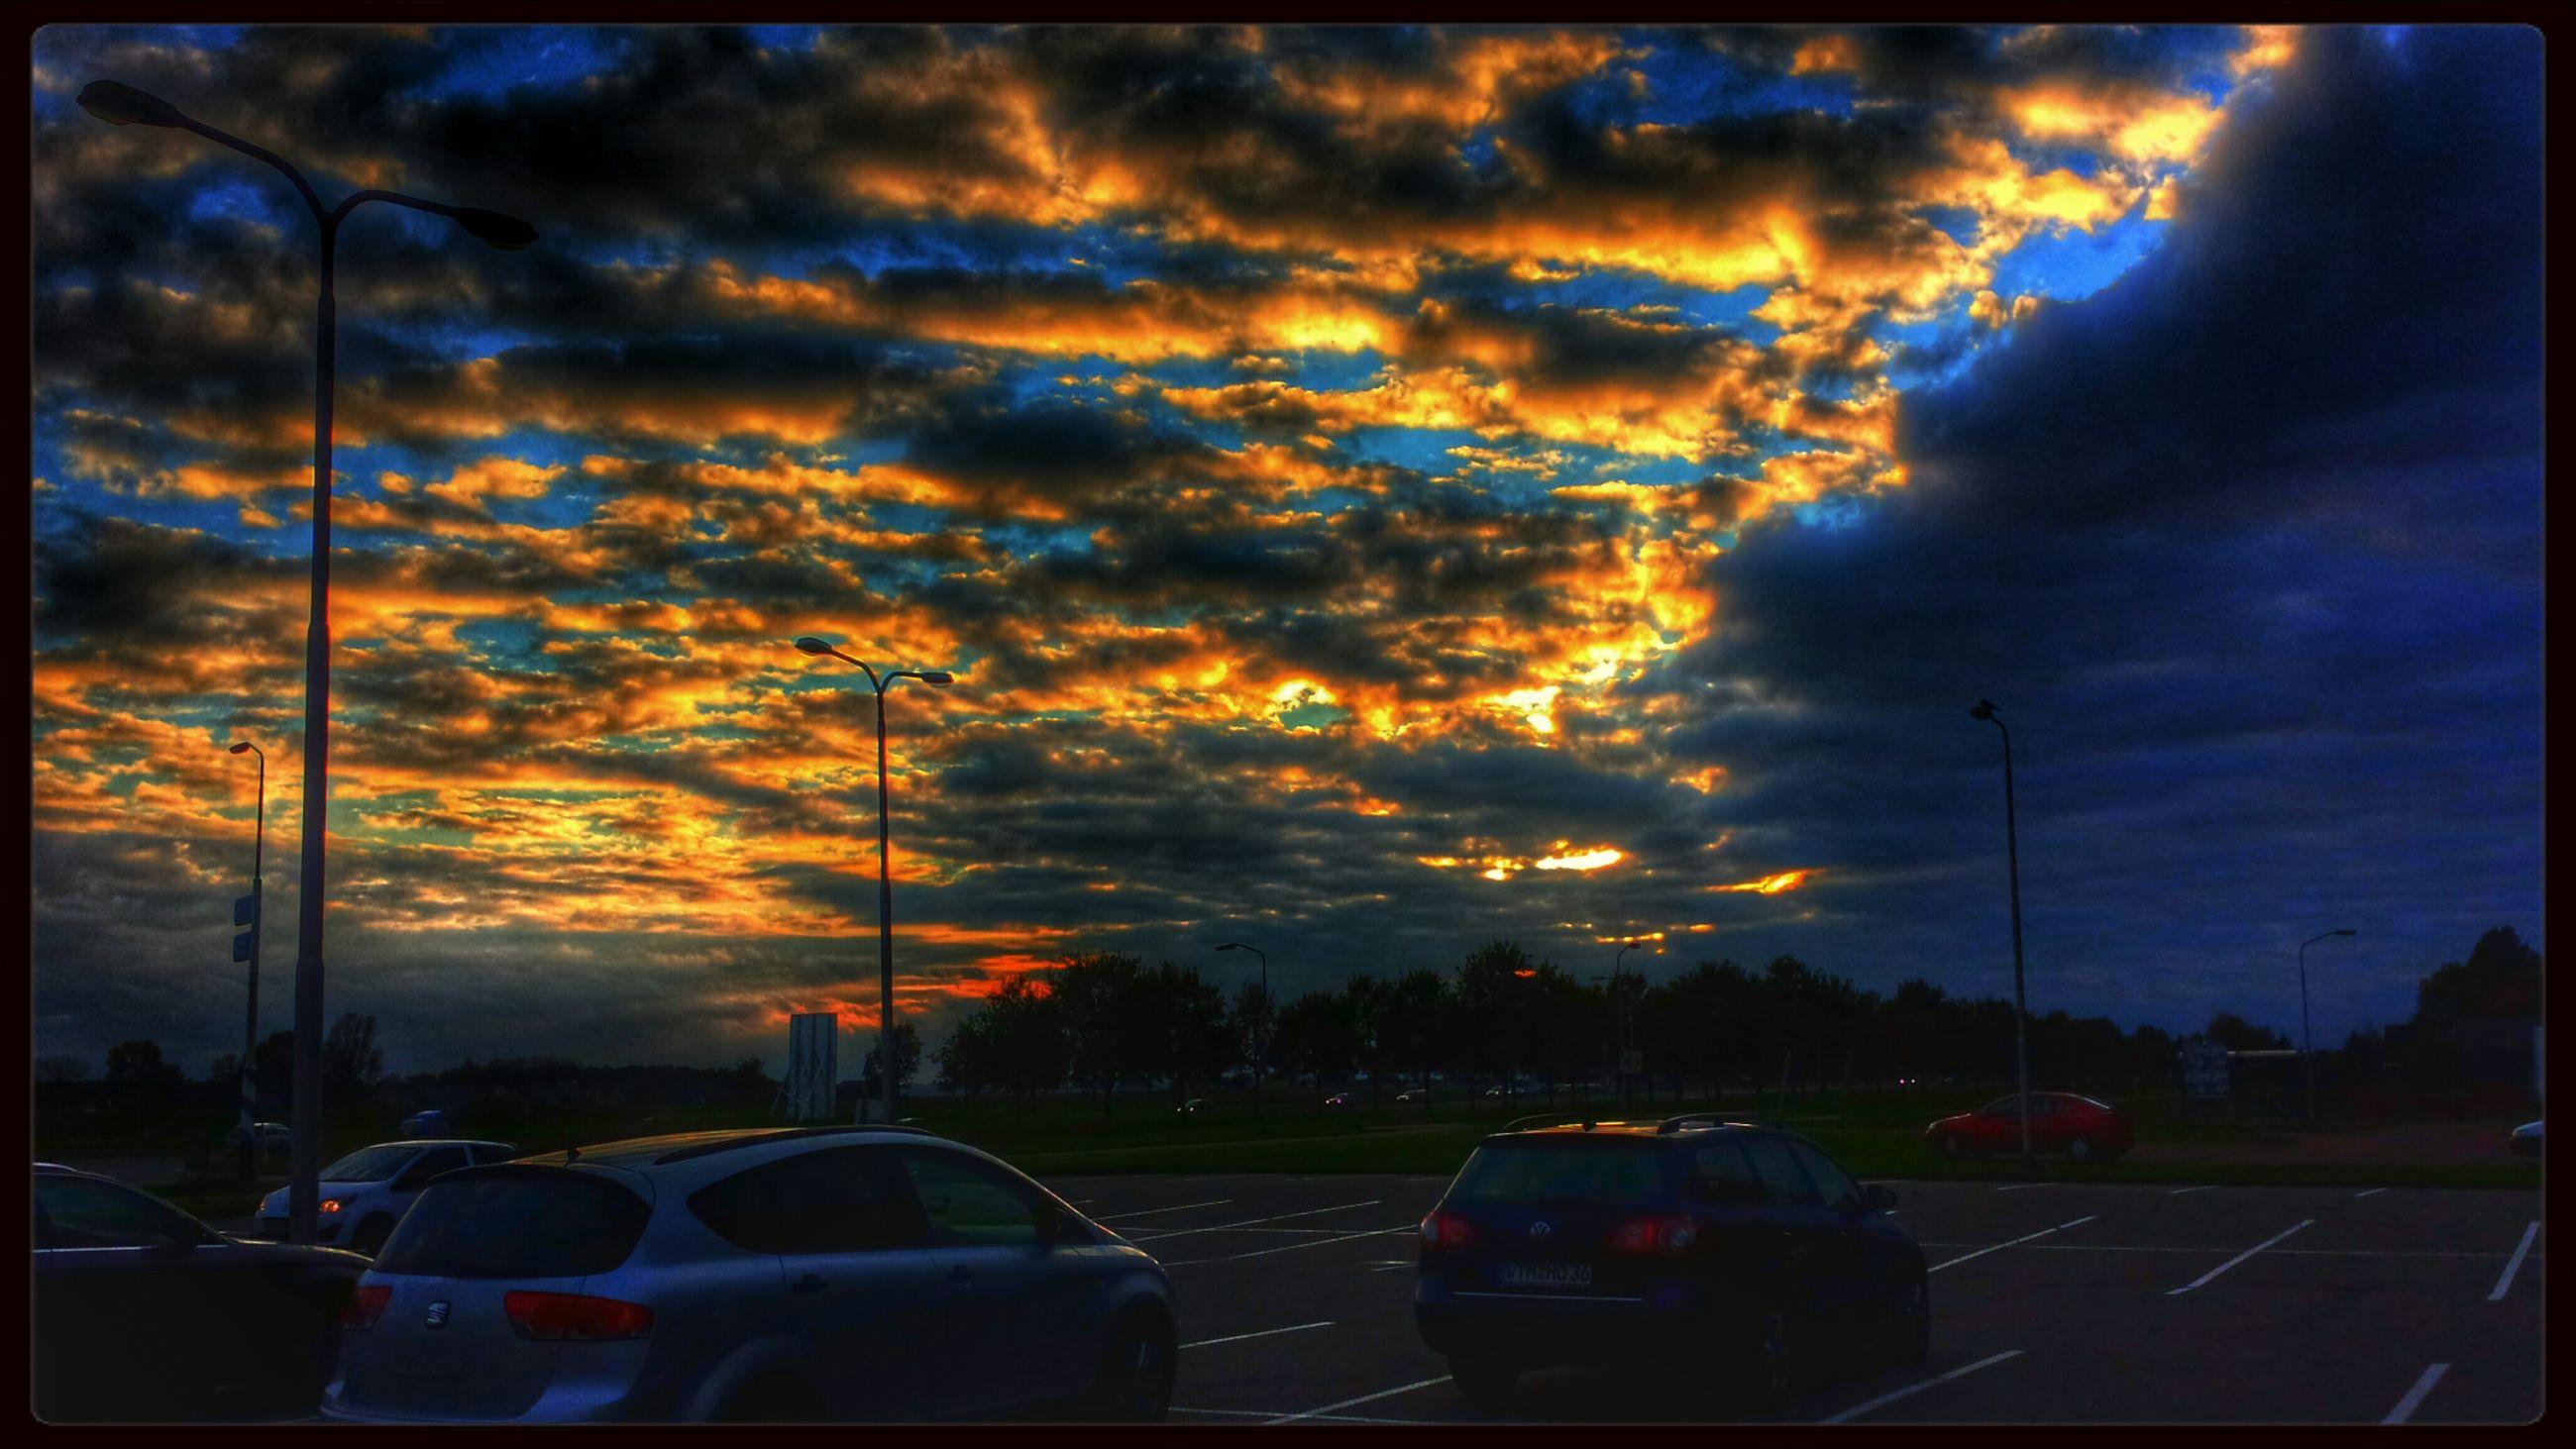 transportation, sky, car, cloud - sky, land vehicle, mode of transport, sunset, cloudy, transfer print, road, auto post production filter, weather, cloud, overcast, dramatic sky, street light, street, storm cloud, dusk, atmospheric mood